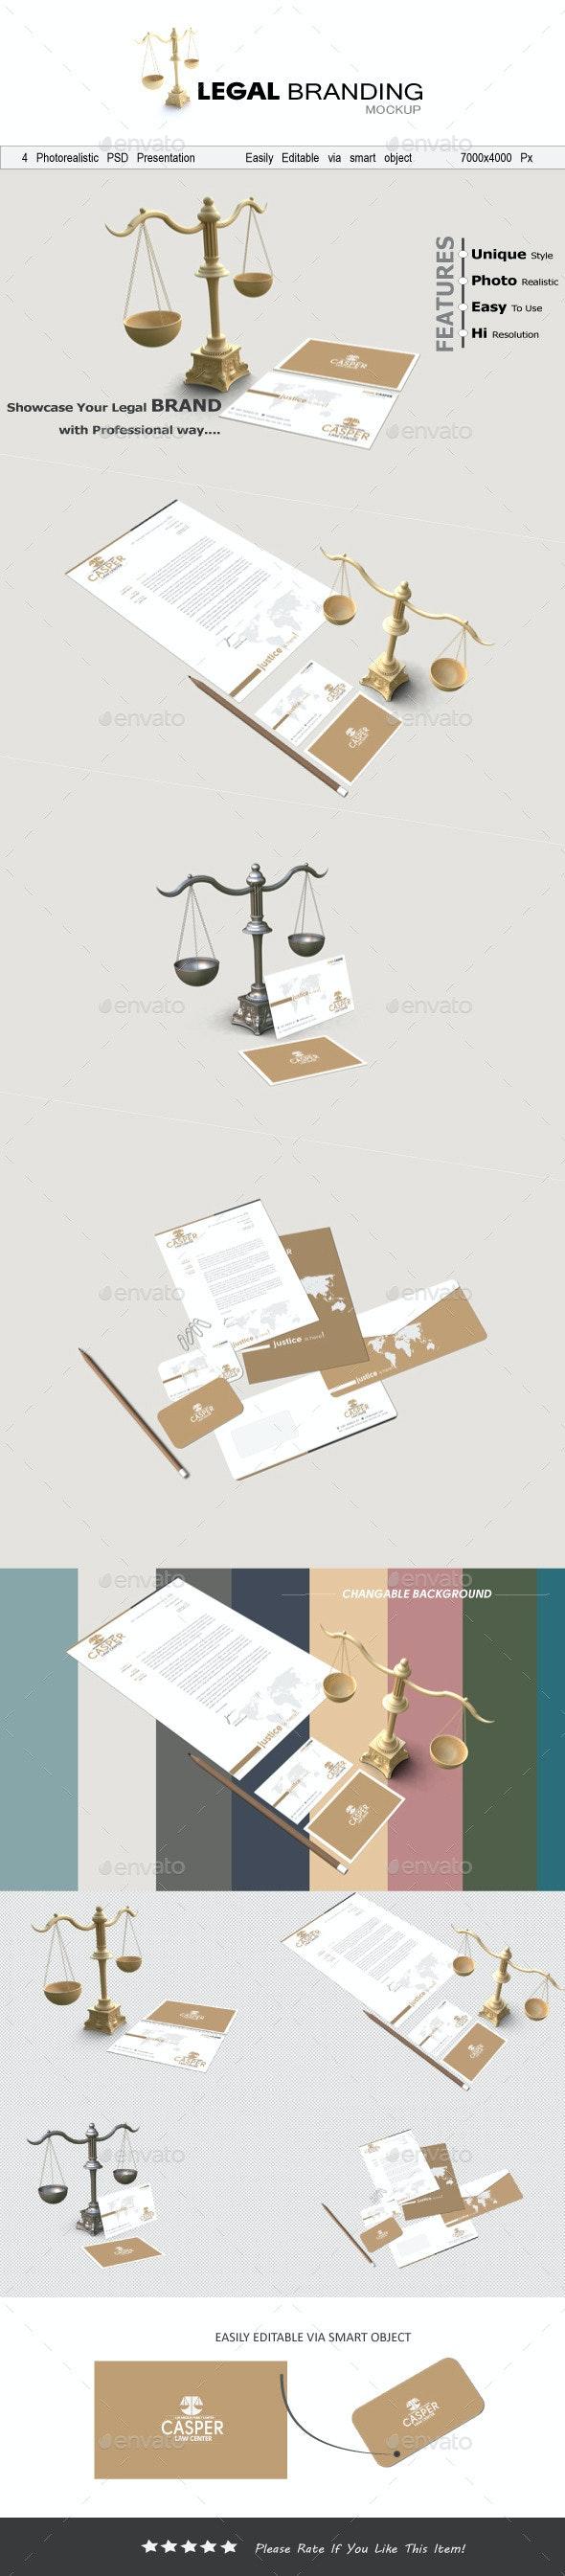 Legal Branding Mockup - Stationery Print